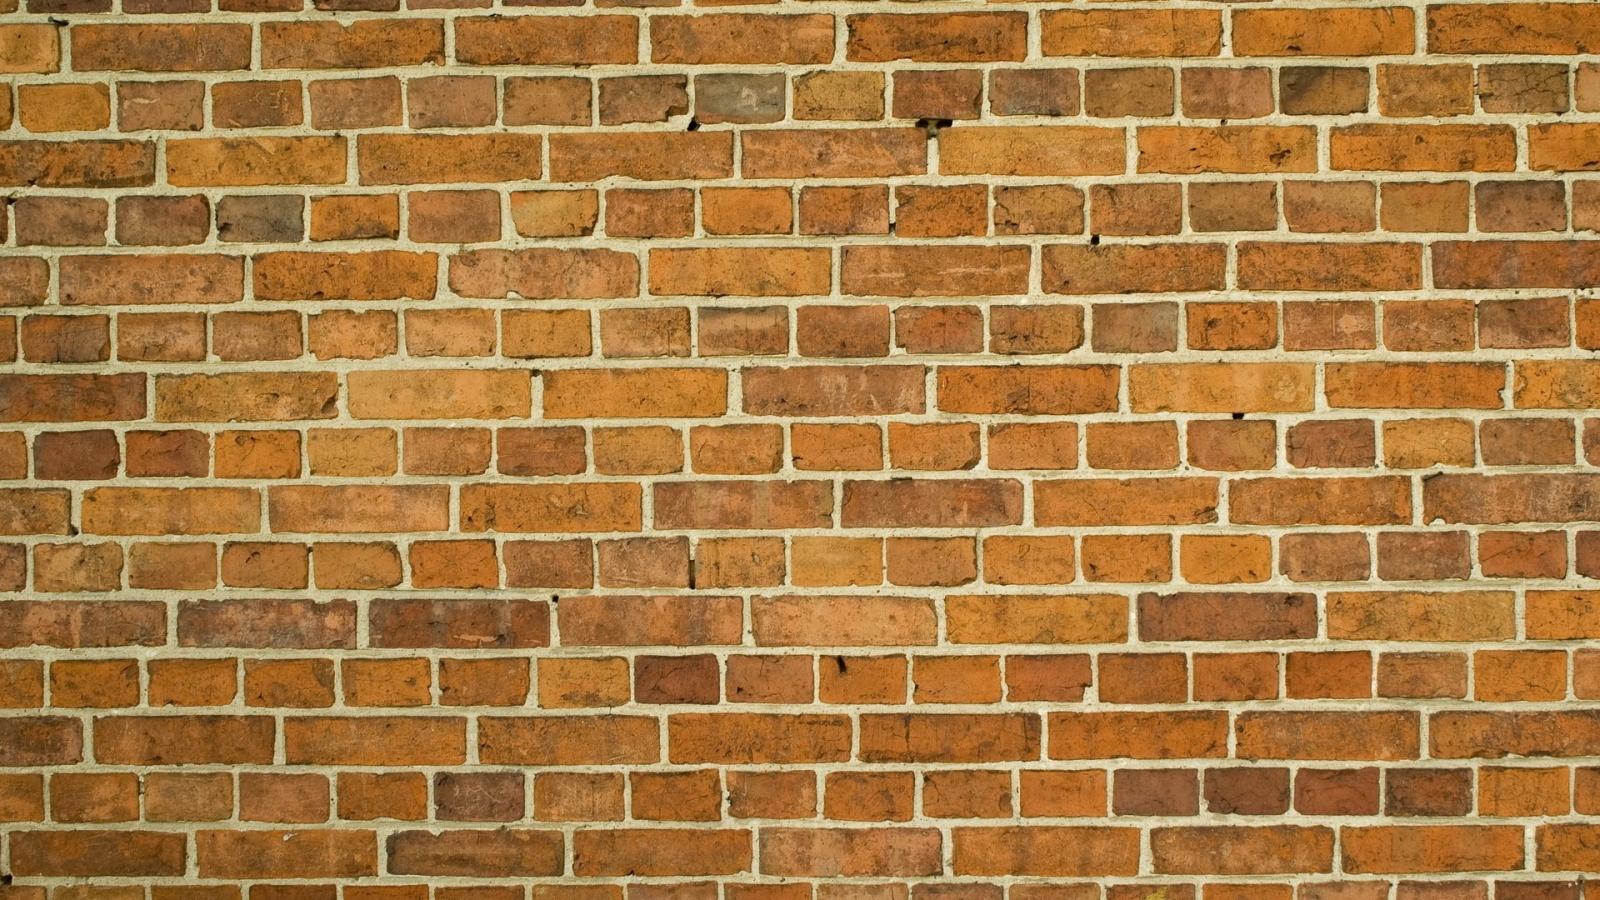 Textura de pared de ladrillos 2 - 1600x900